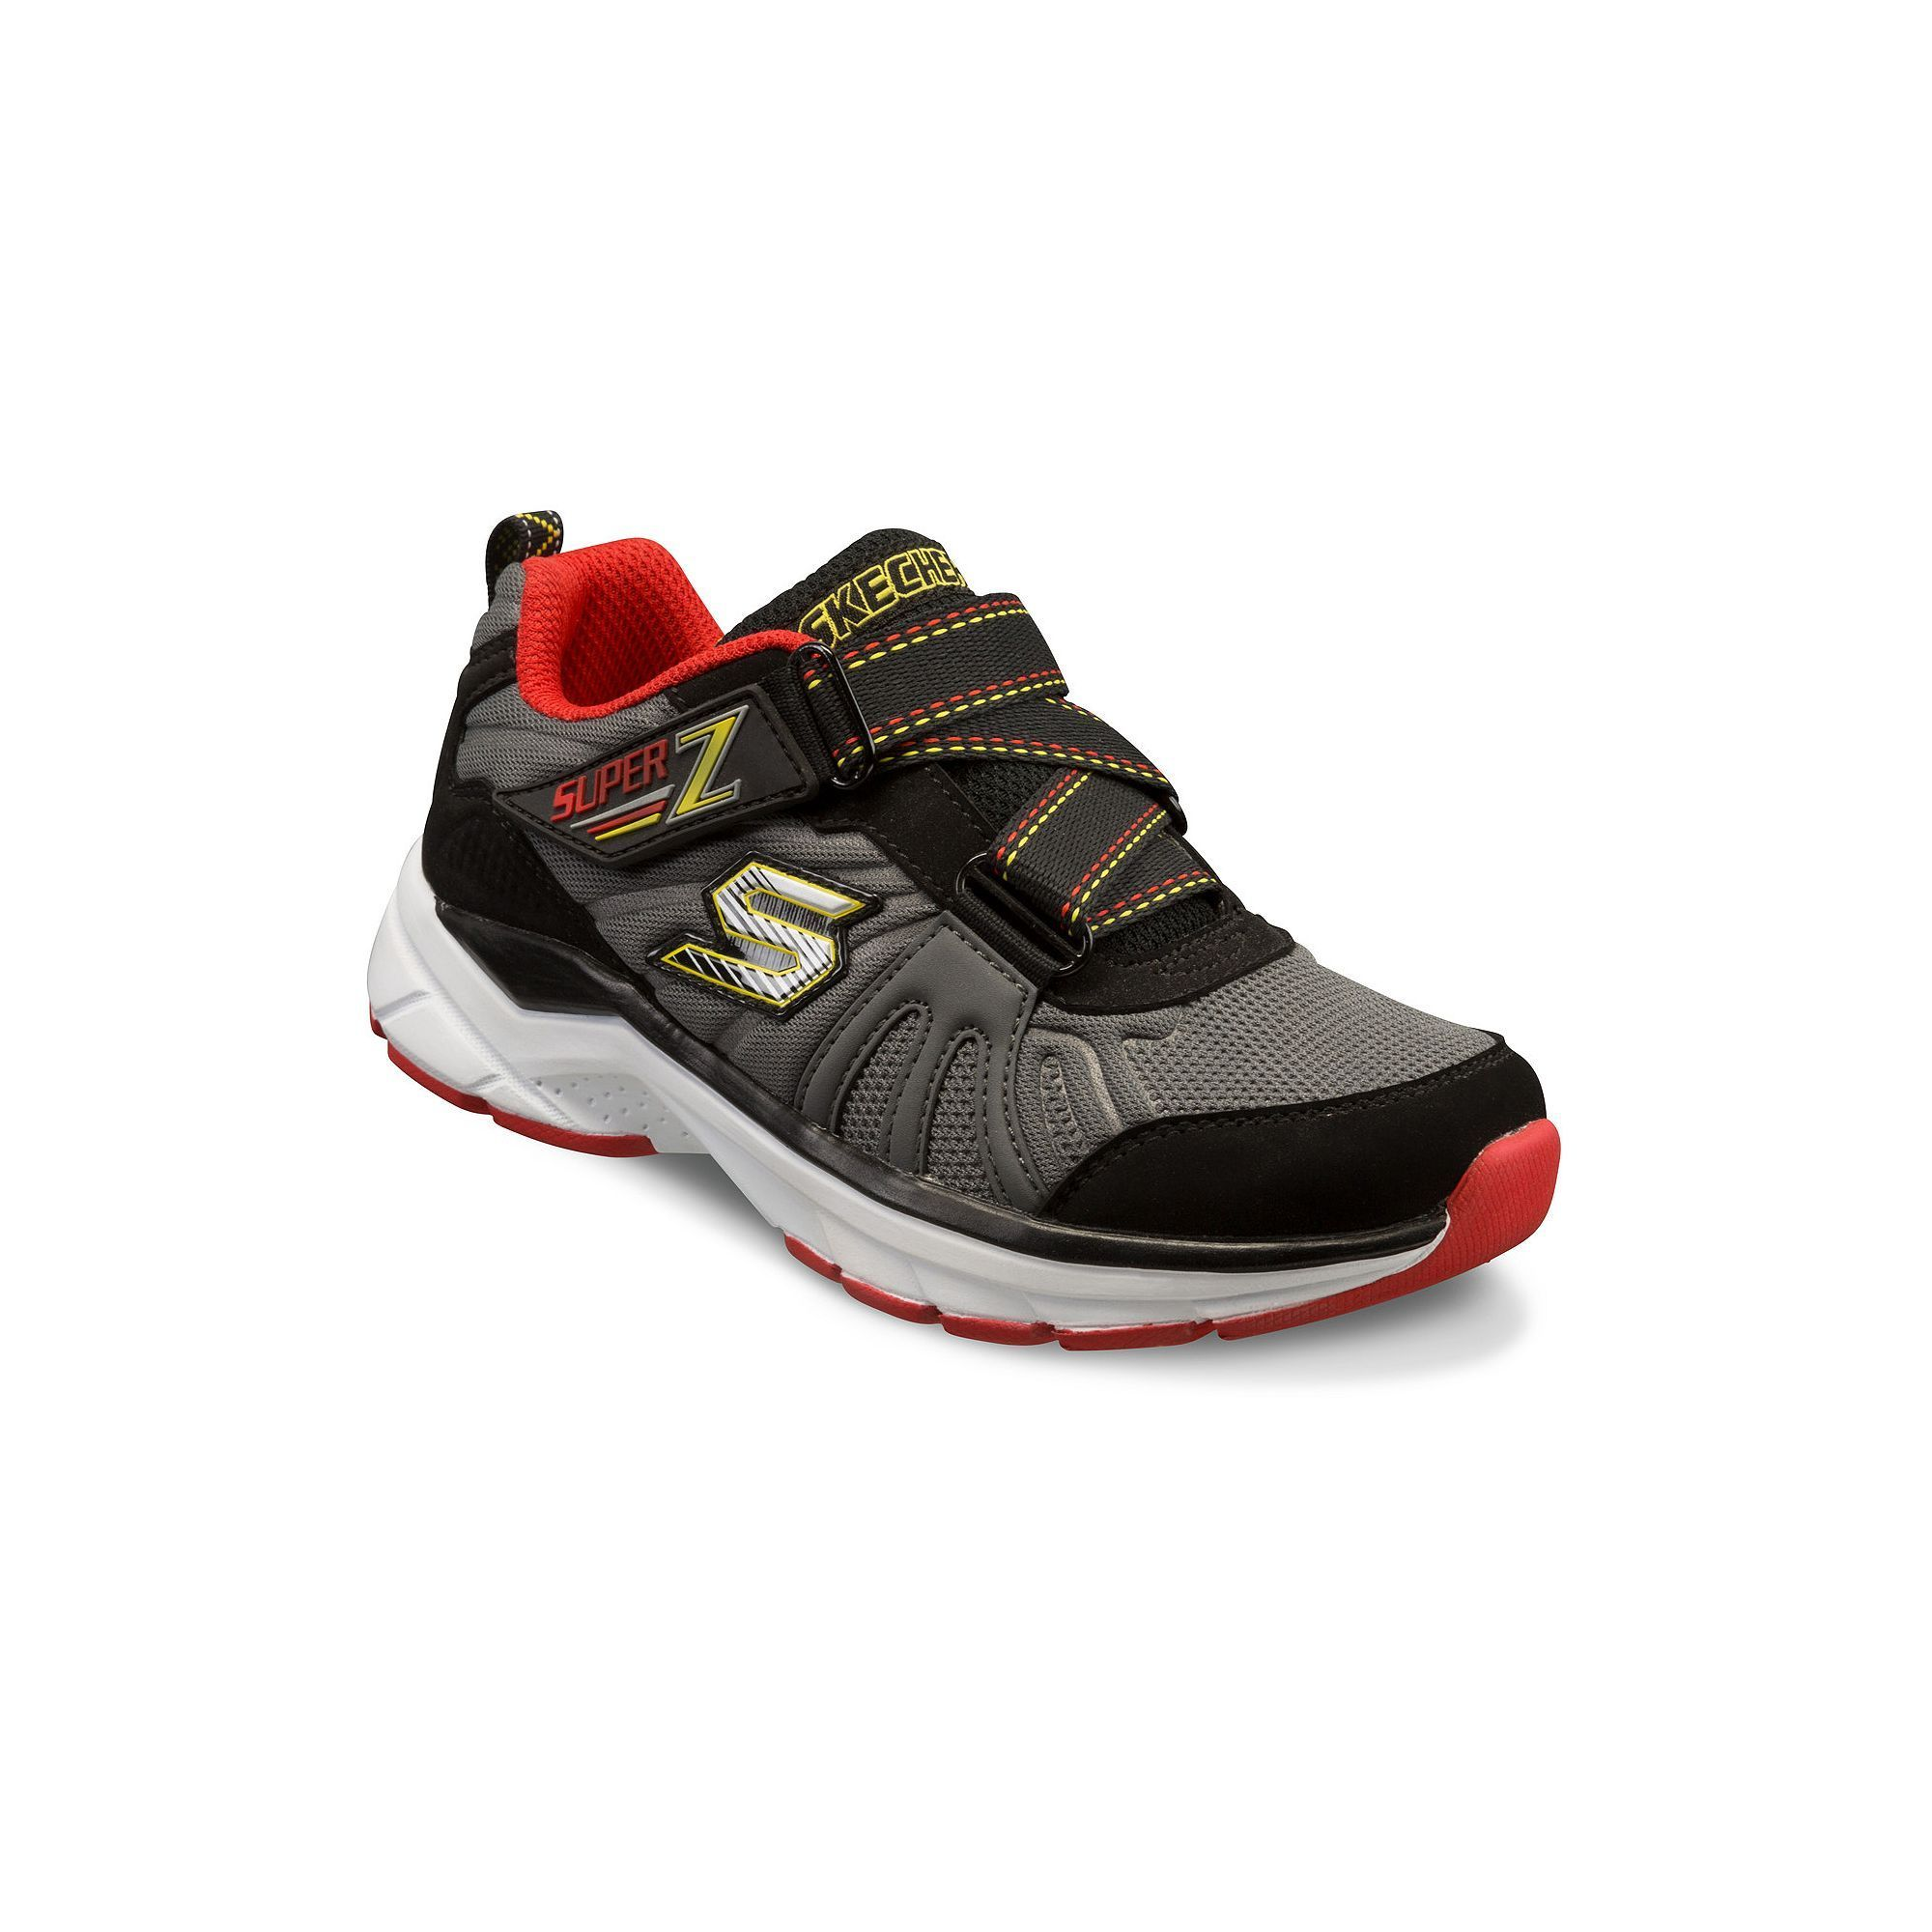 77d24f97fc7 Skechers Ultrasonix Boys  Shoes